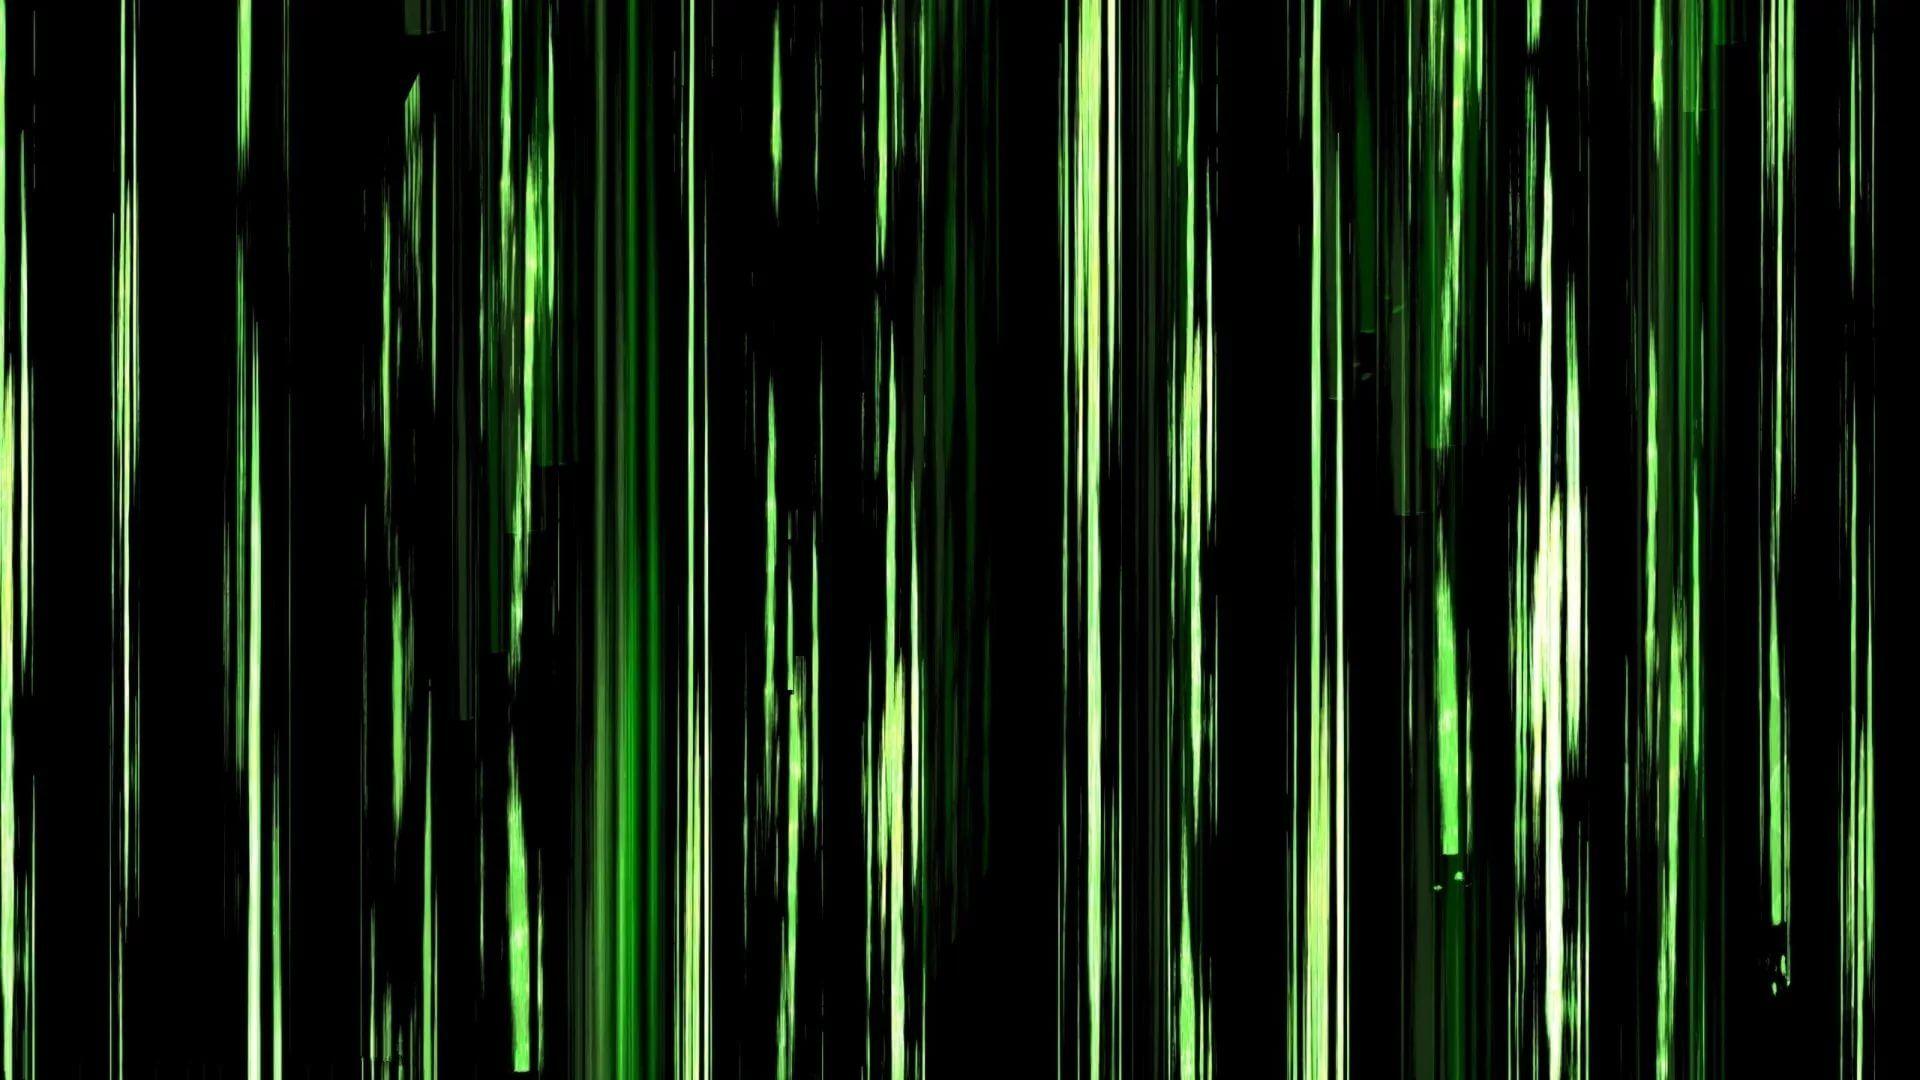 Neon Green full screen hd wallpaper